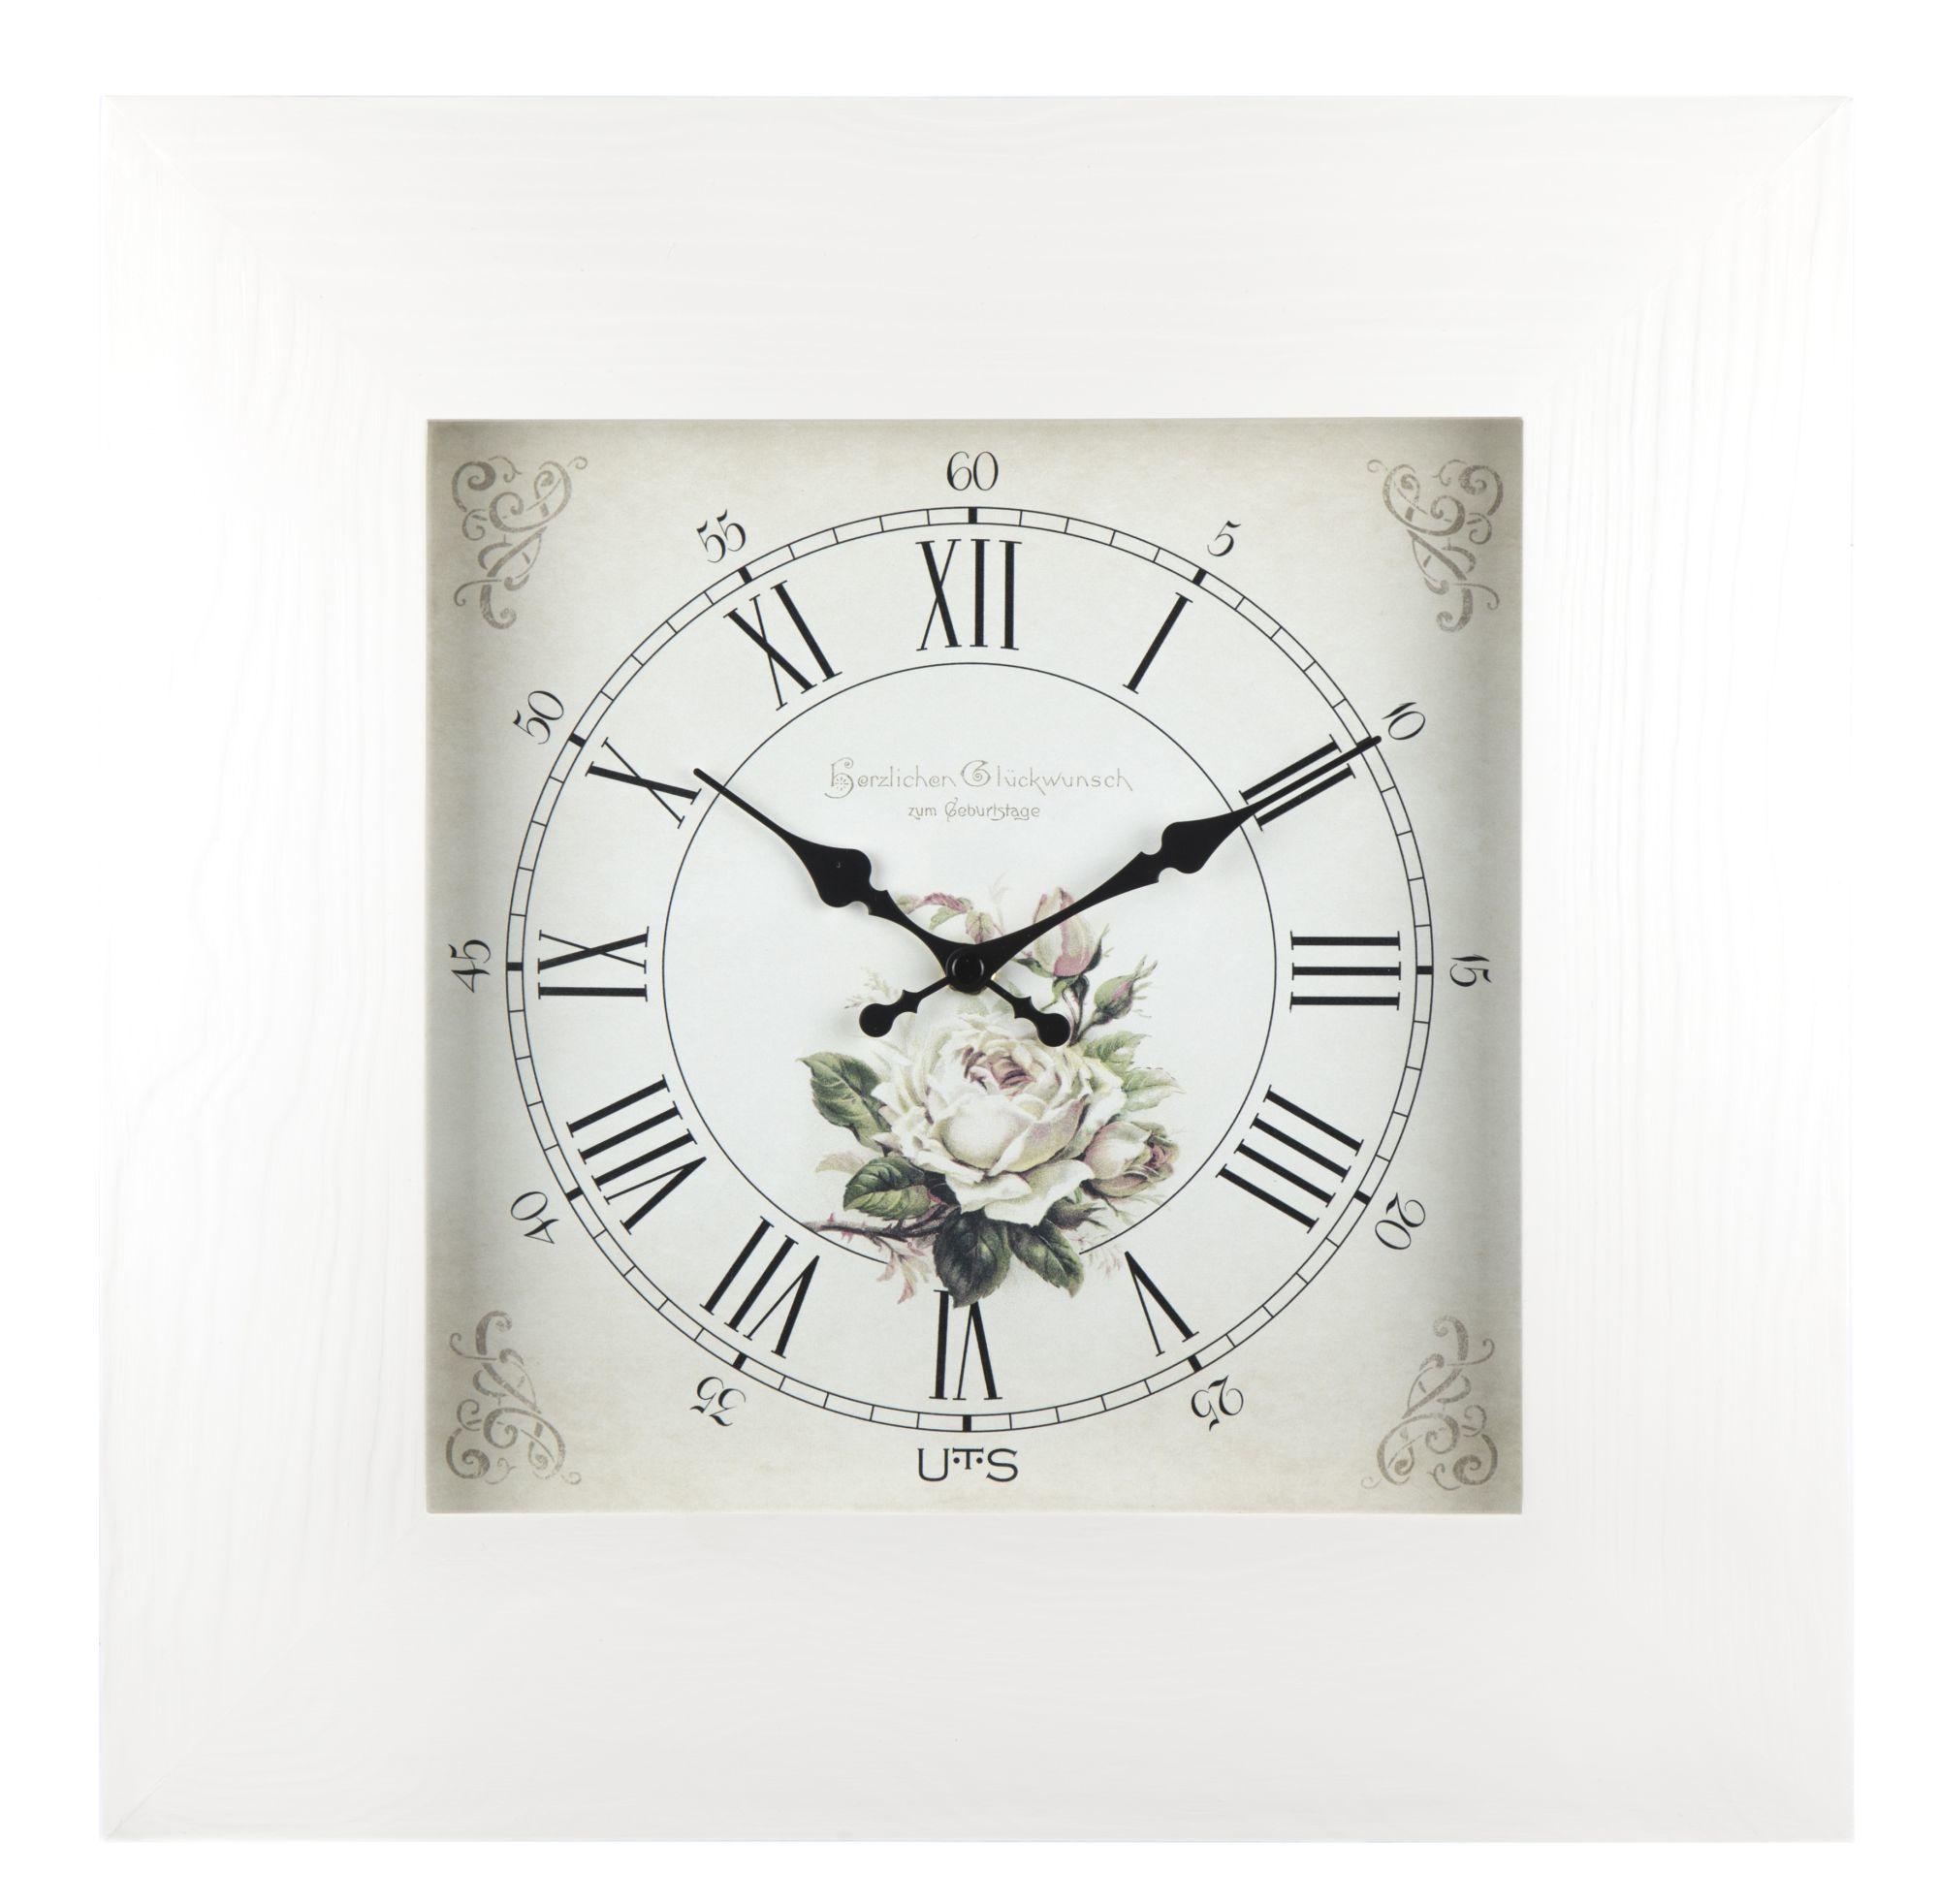 Часы настенные Часы настенные Tomas Stern 7023 chasy-nastennye-tomas-stern-7023-germaniya-tayvan.jpg